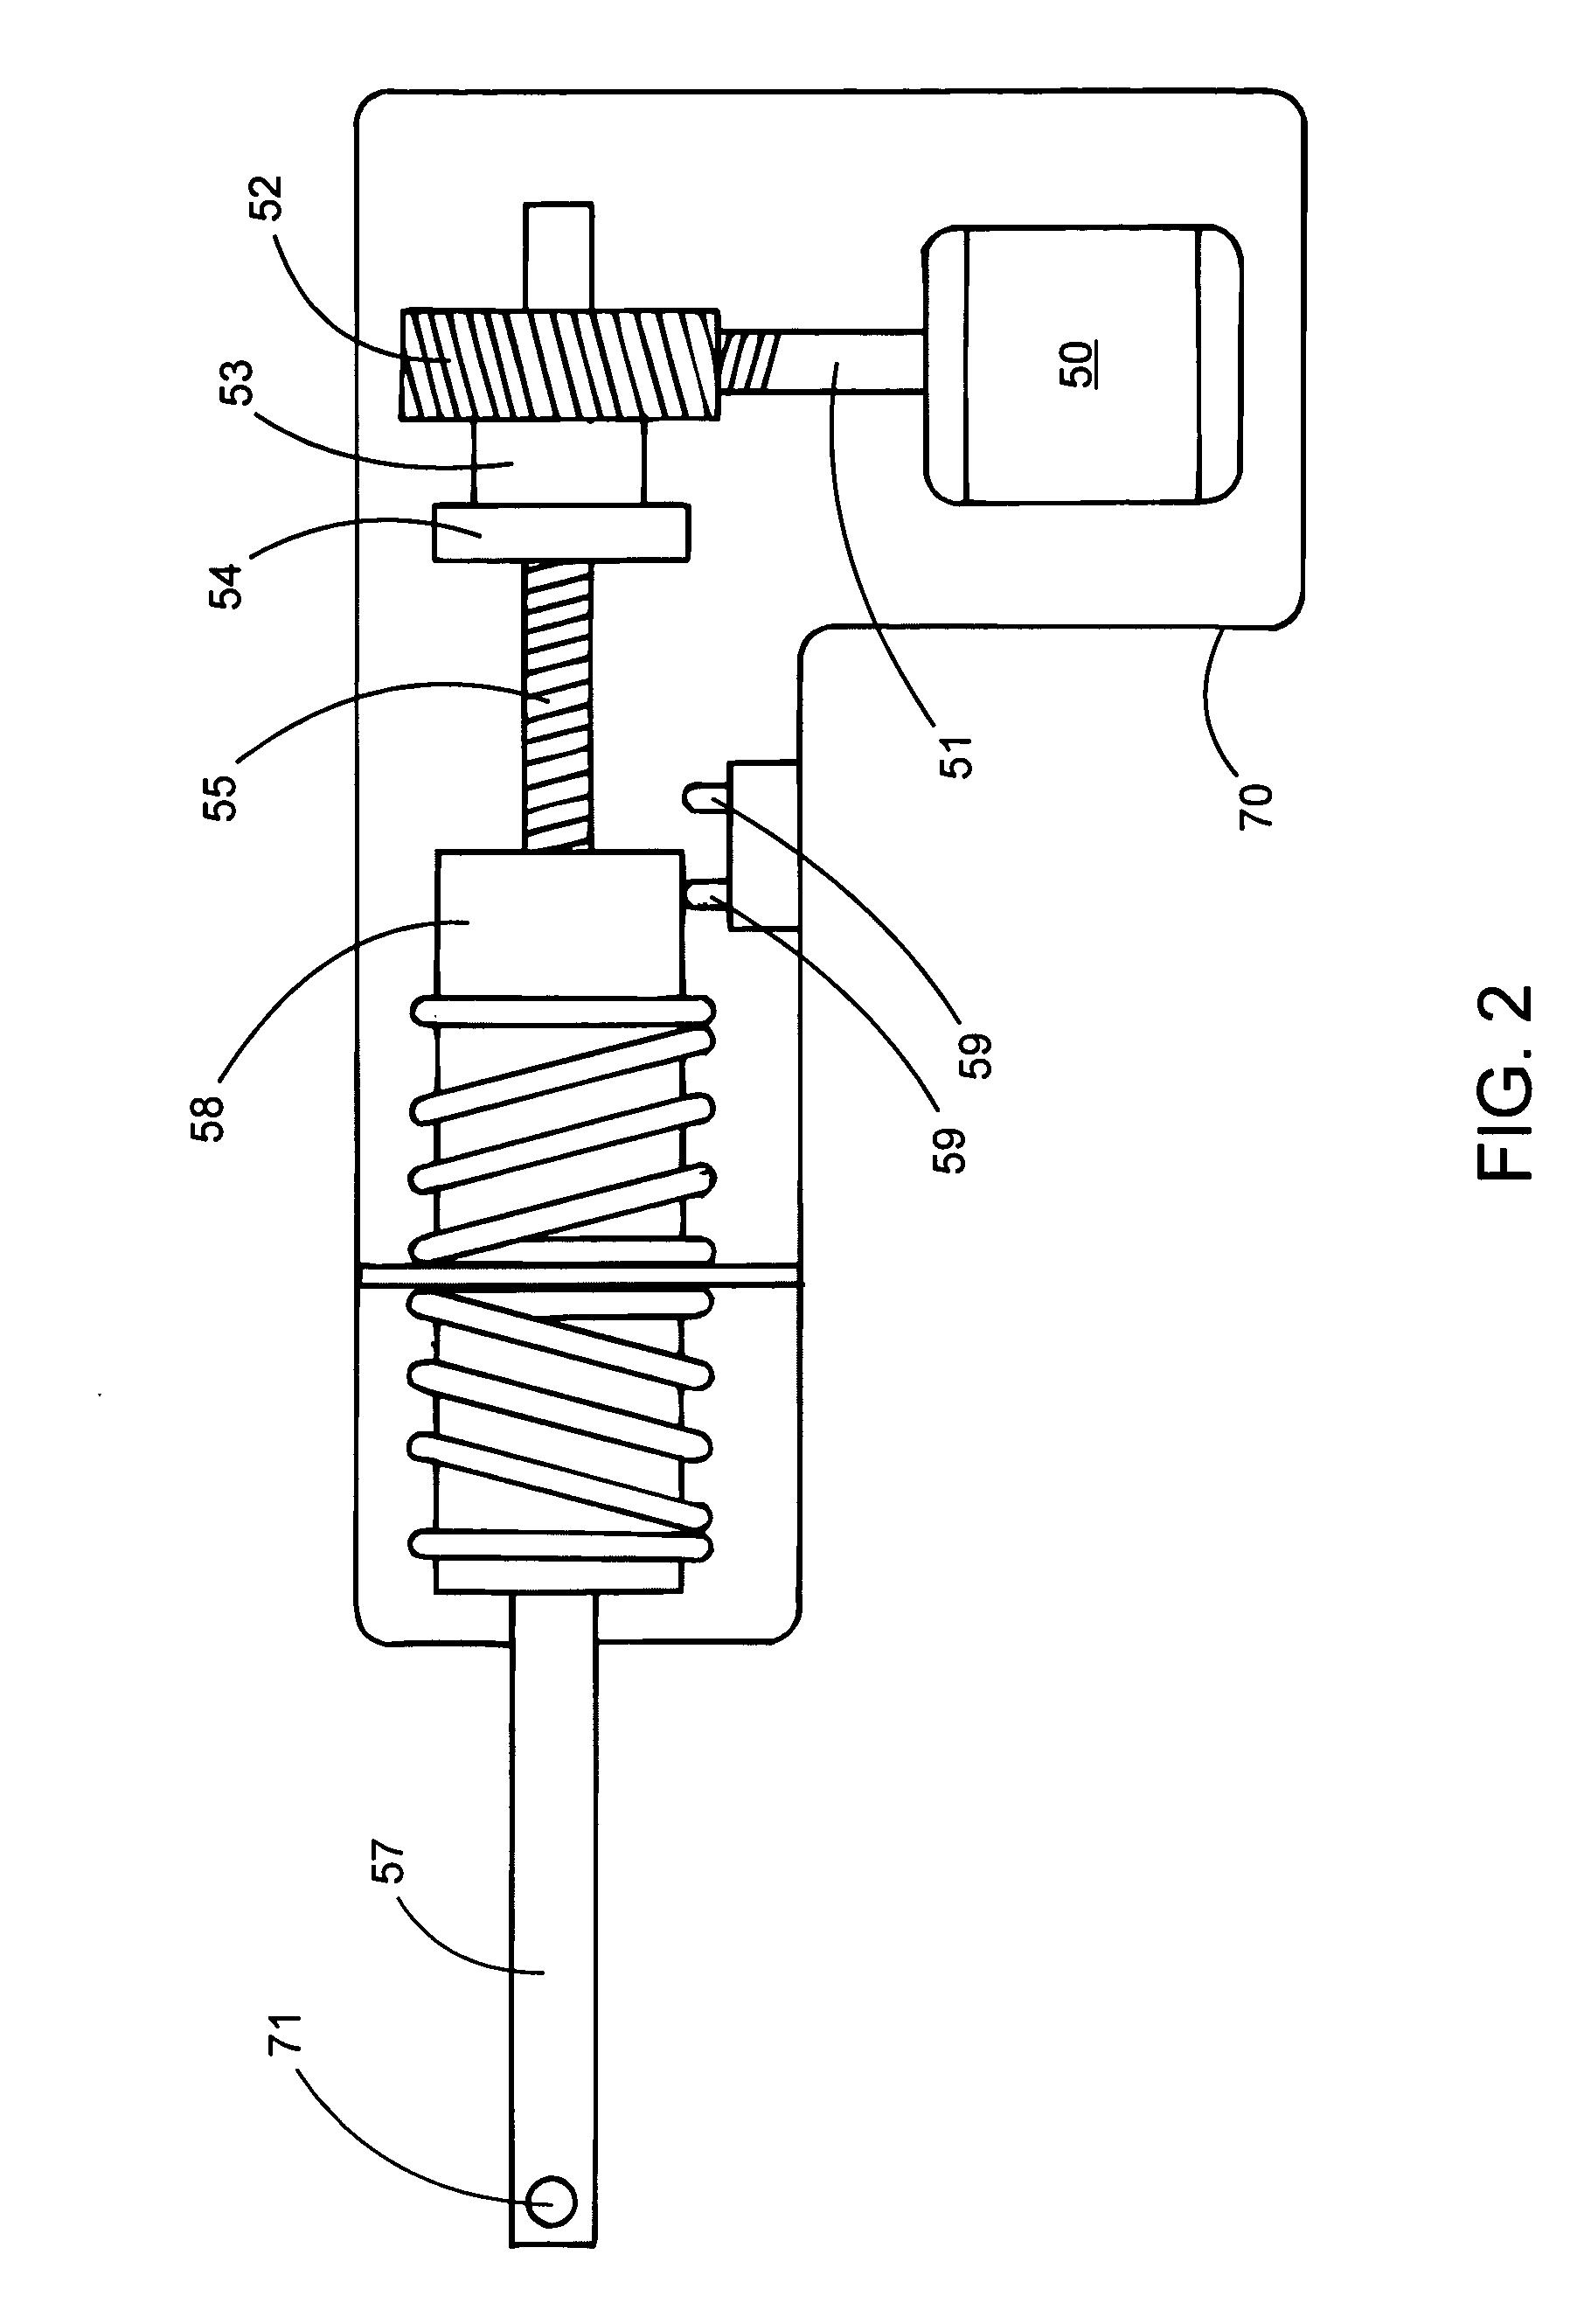 Wiring Diagram For Motorhome Electric Step • Nayabfun on